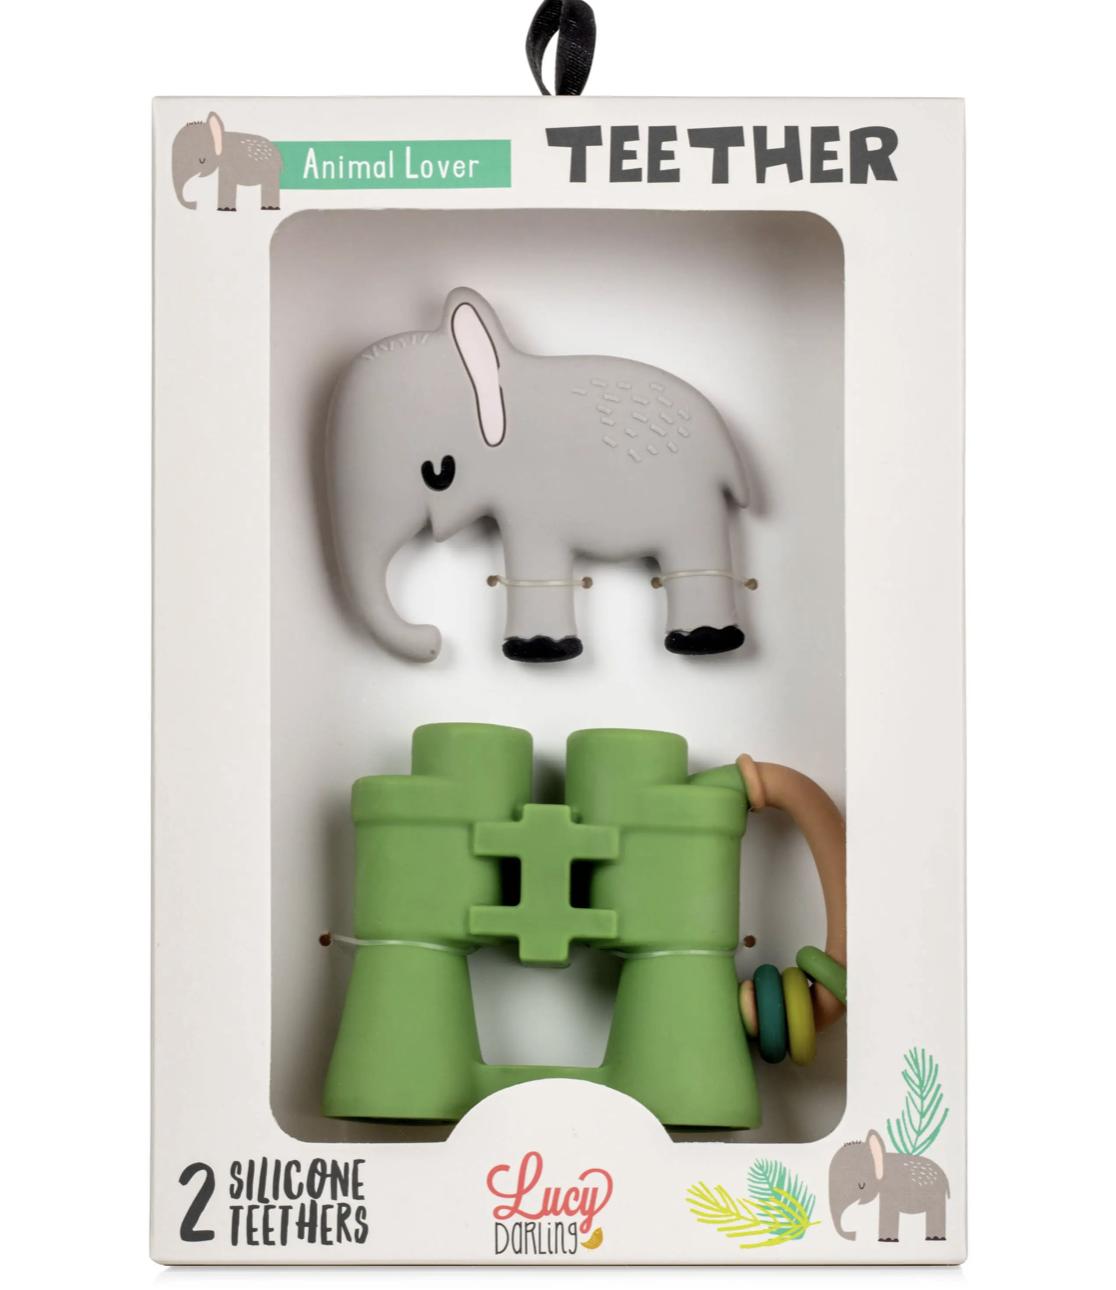 Animal Lover Teether Set